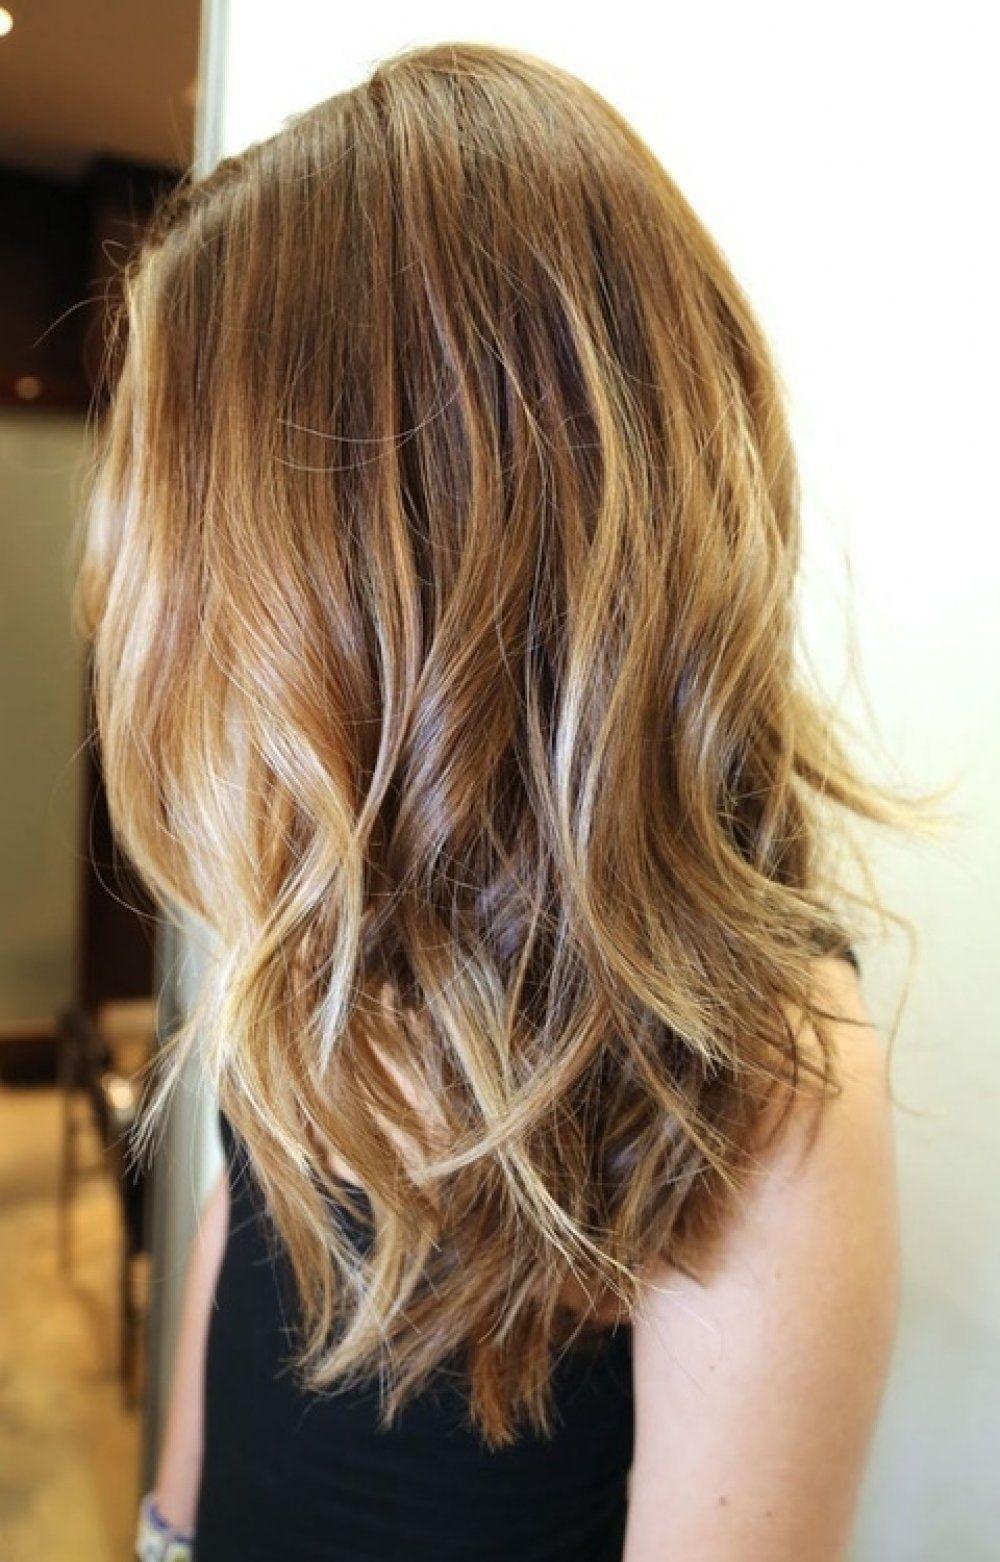 Dirty blonde hair color hair and makeup pinterest hair